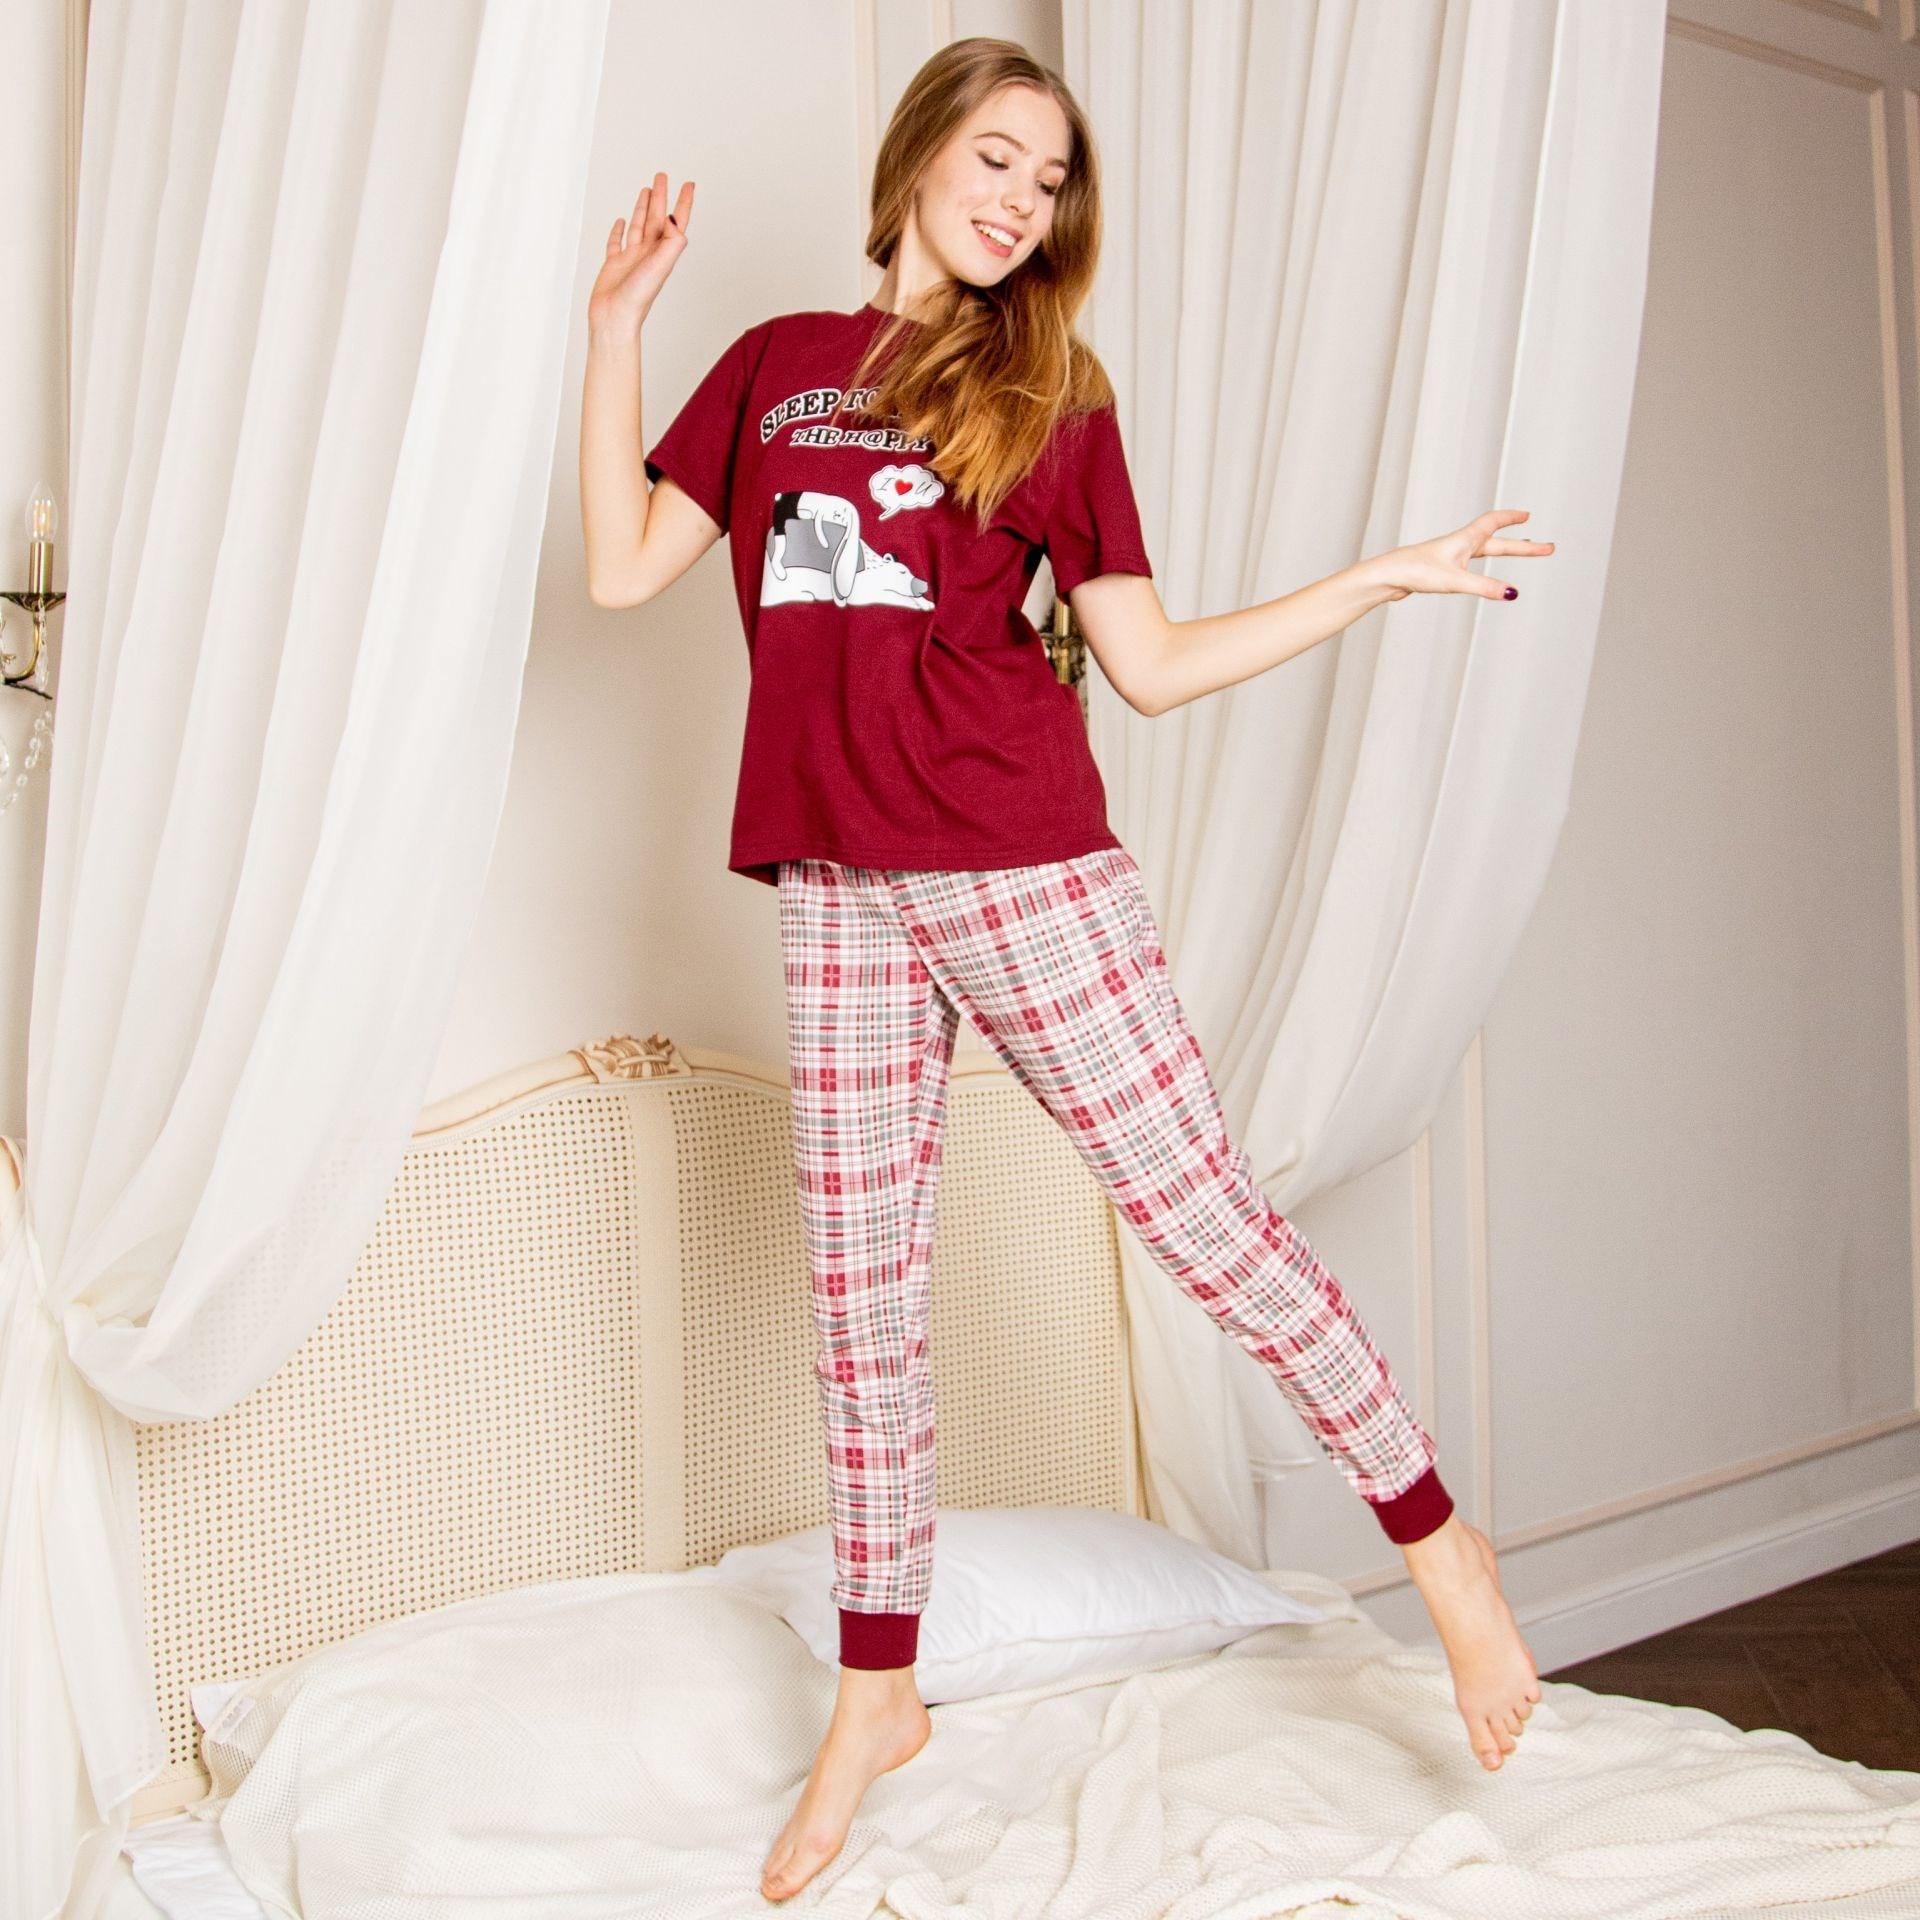 Atoff casa pijama feminino zhp 039 (borgonha + gaiola)